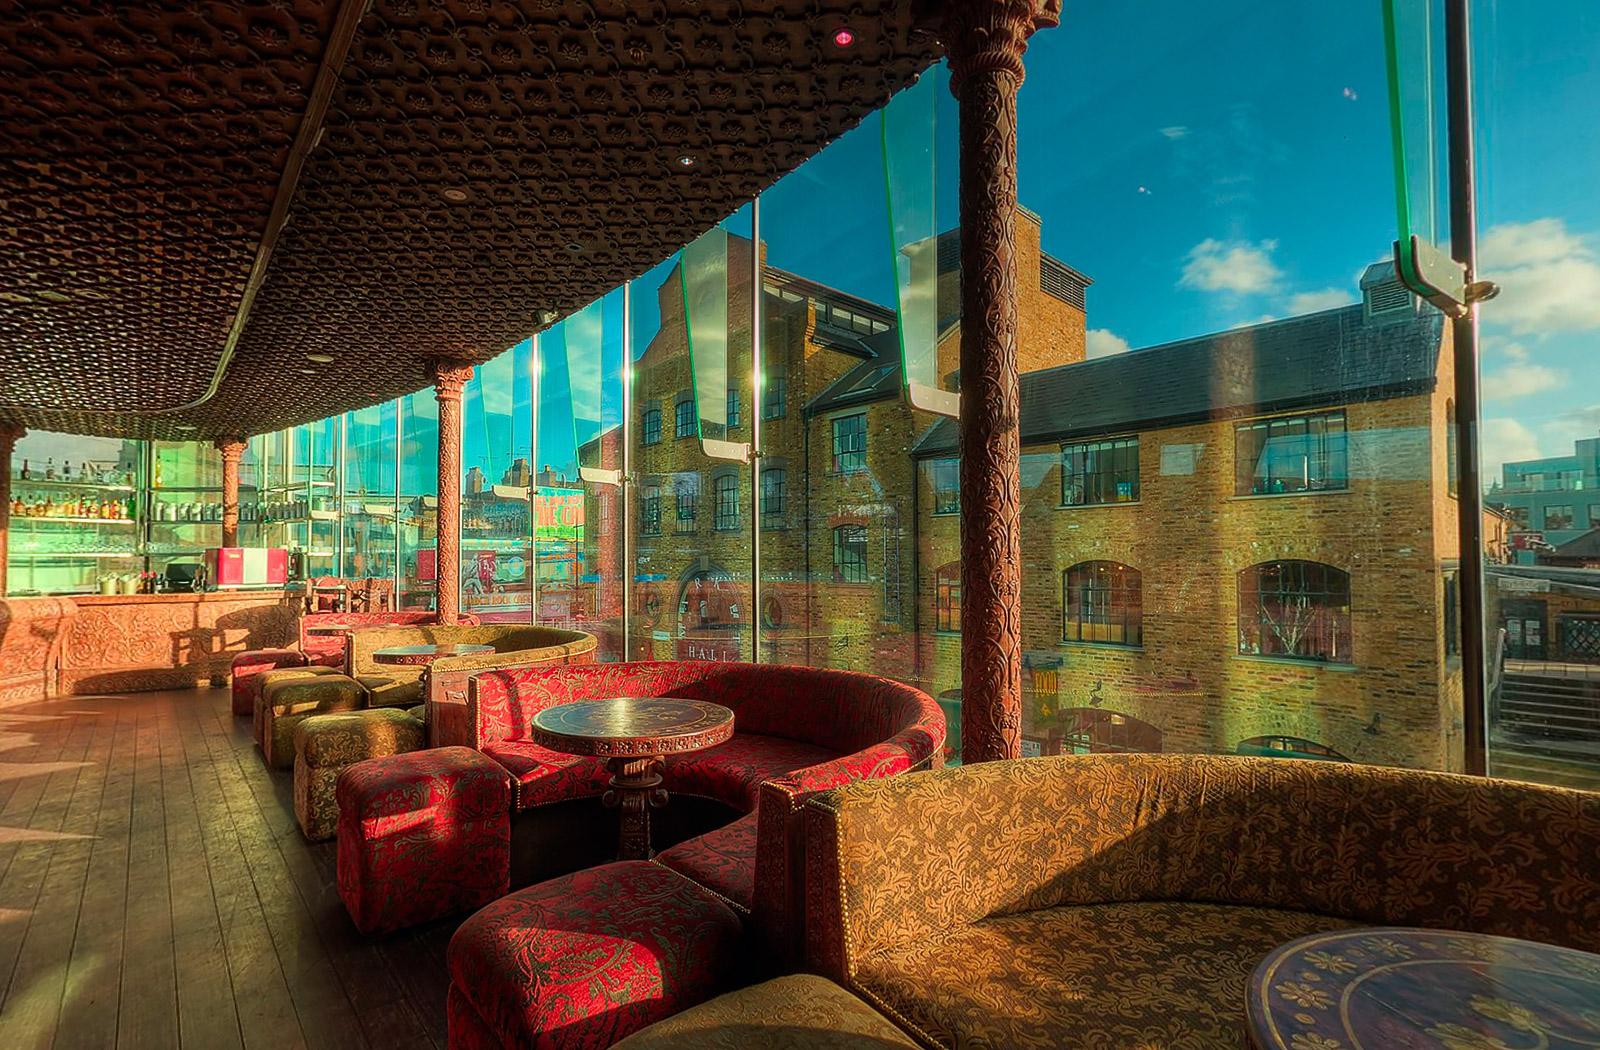 Gilgamesh Restaurant and Bar, London